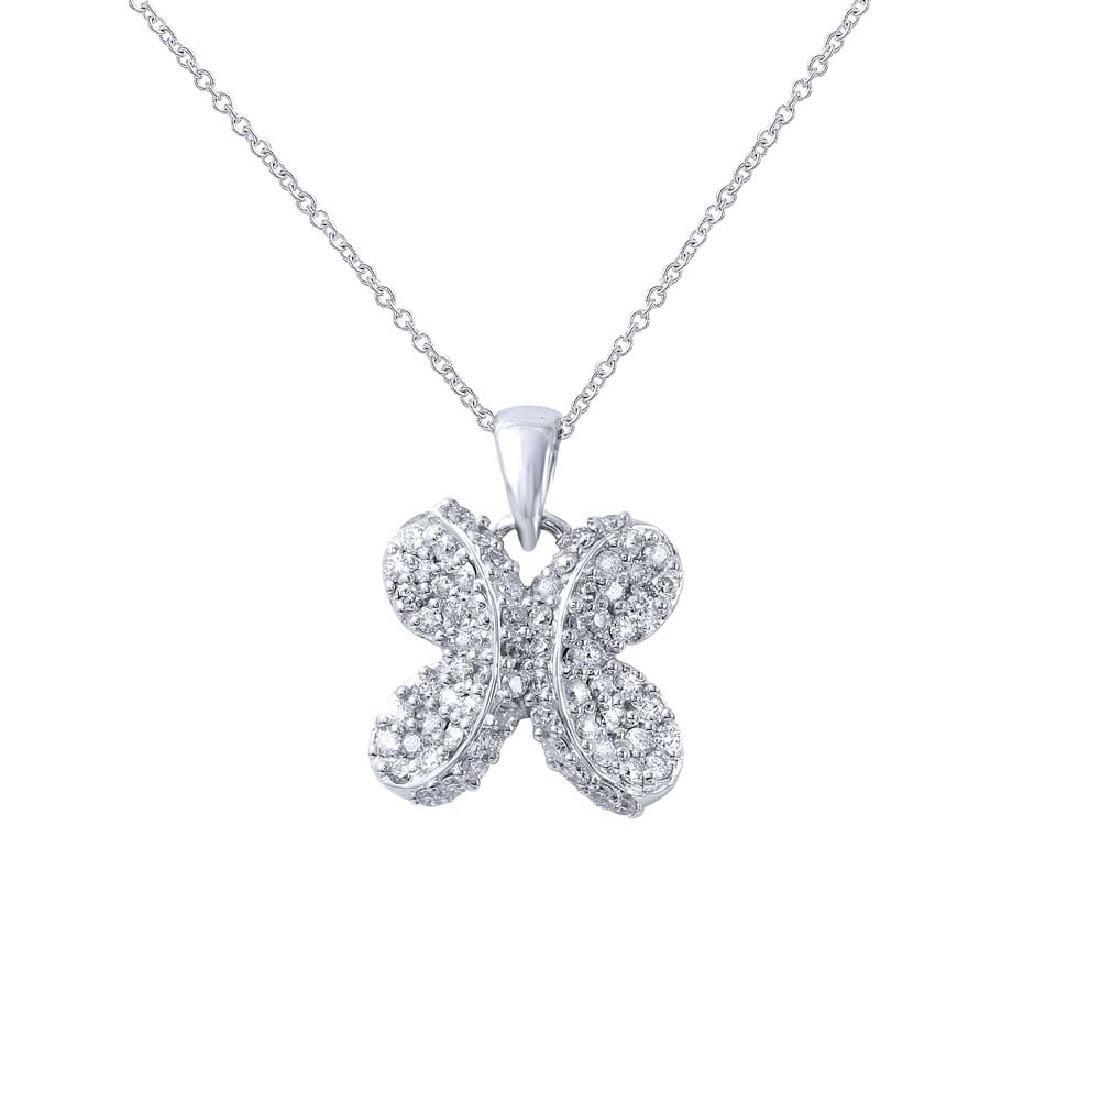 Genuine 0.67 TCW 18K White Gold Ladies Necklace